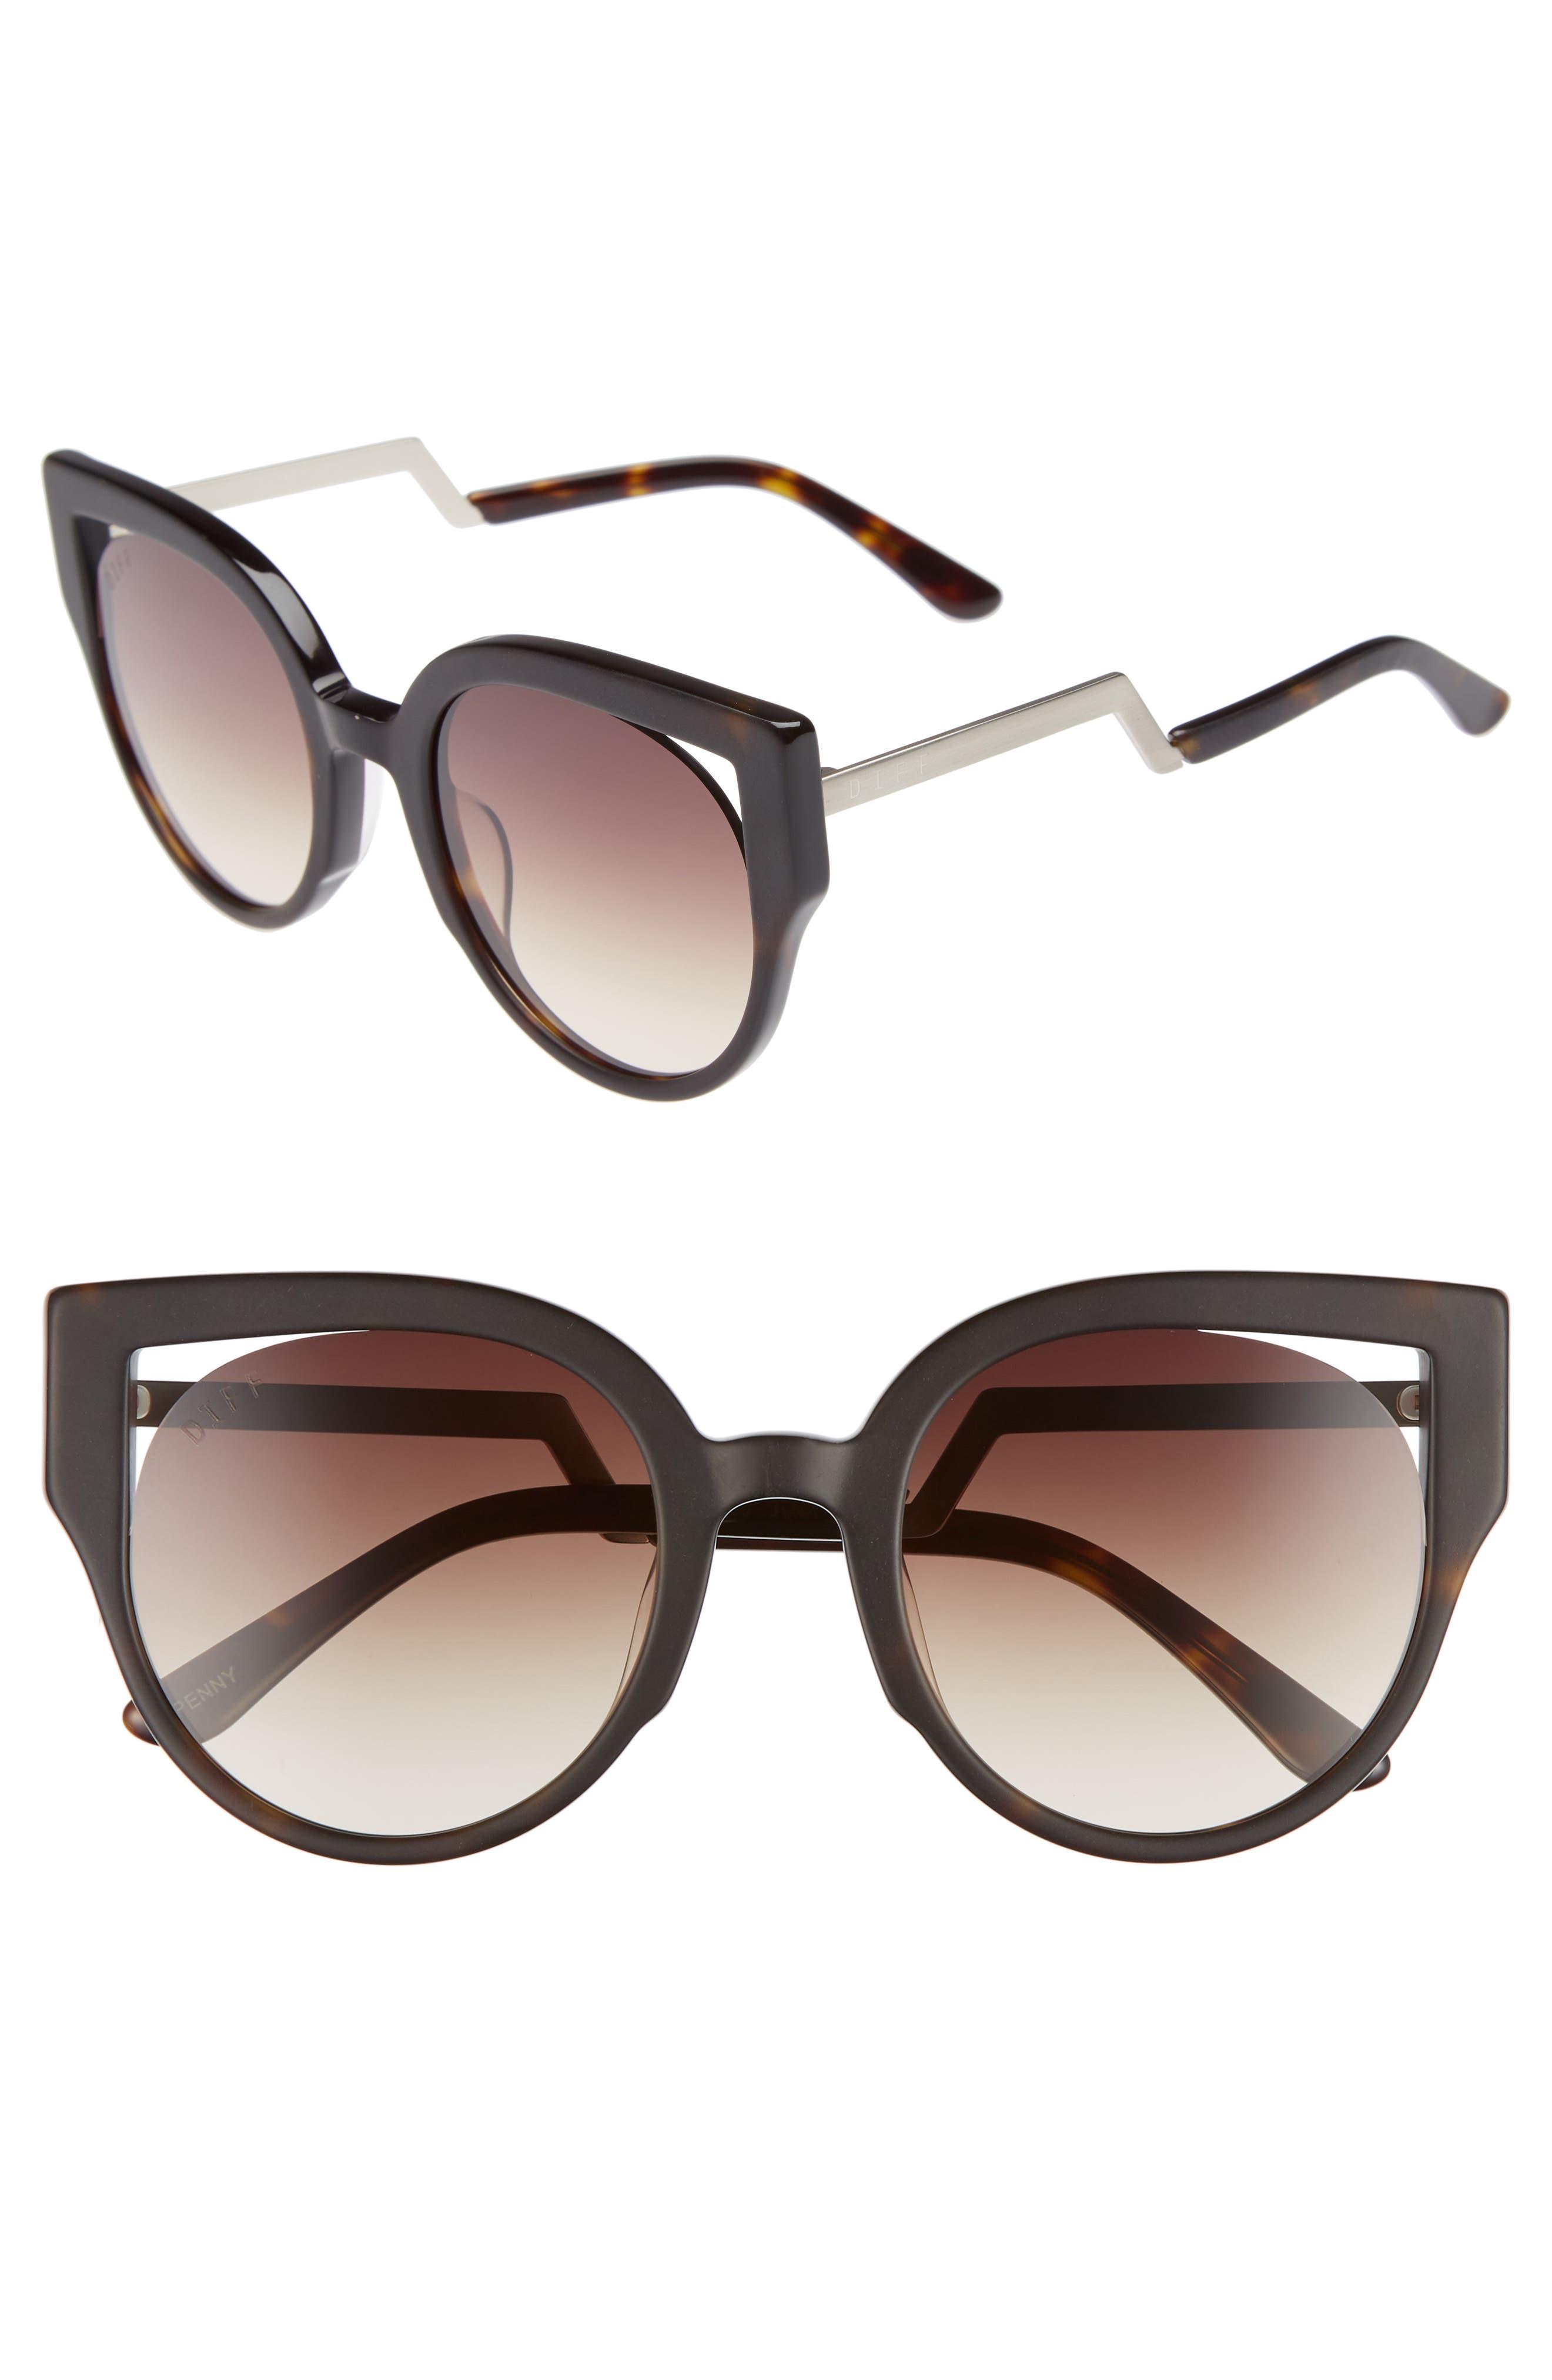 Penny 55mm Cat Eye Sunglasses,                         Main,                         color, MATTE TORTOISE/ BROWN